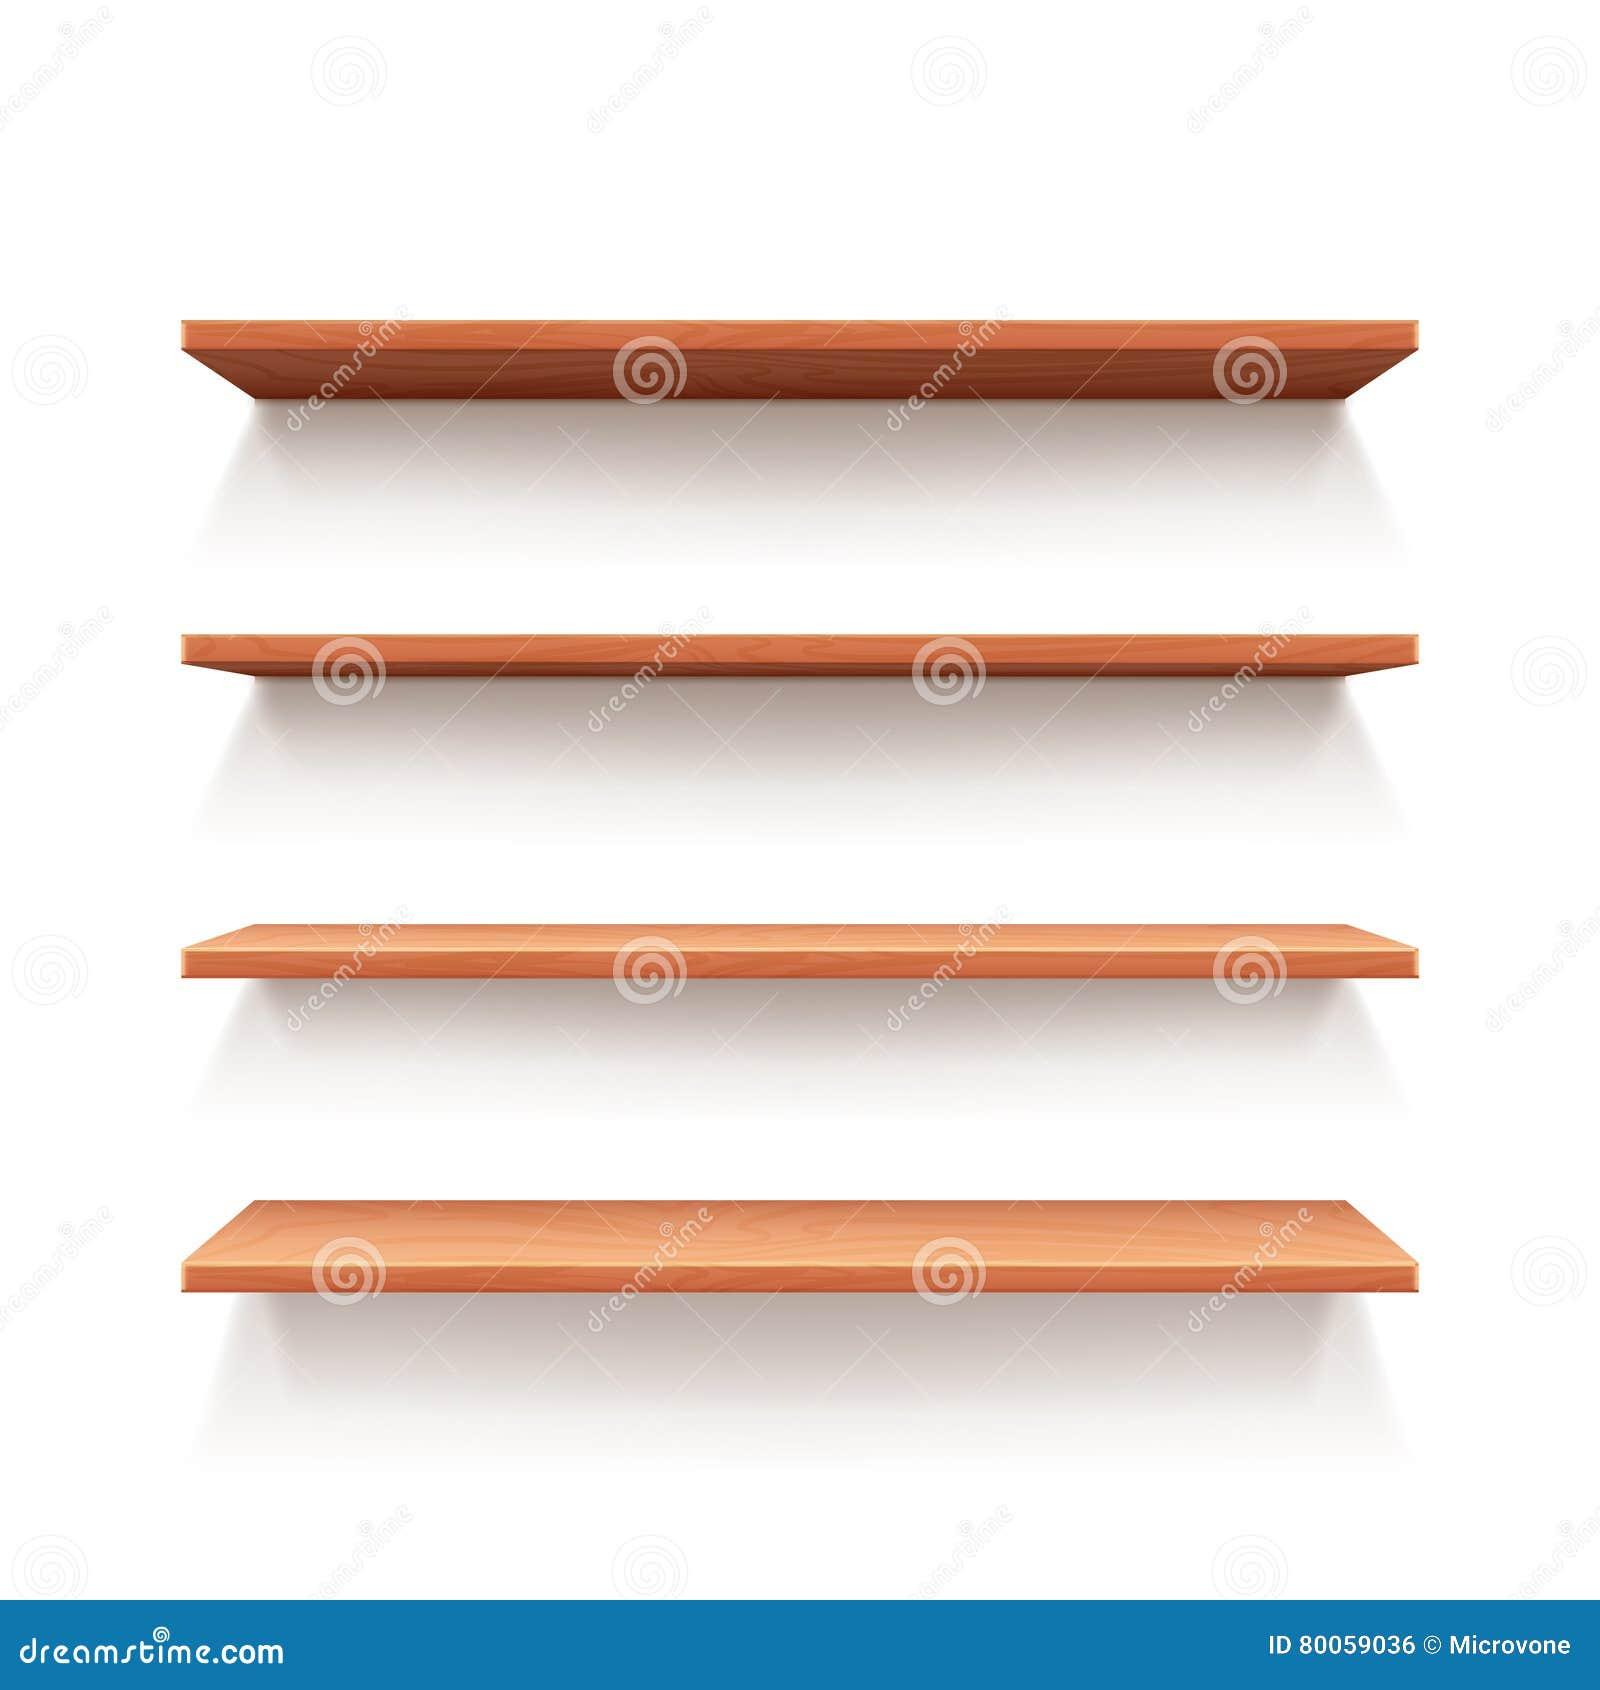 Interior wooden shelves free vector - Royalty Free Vector Book Design Empty Illustration Interior Shelf